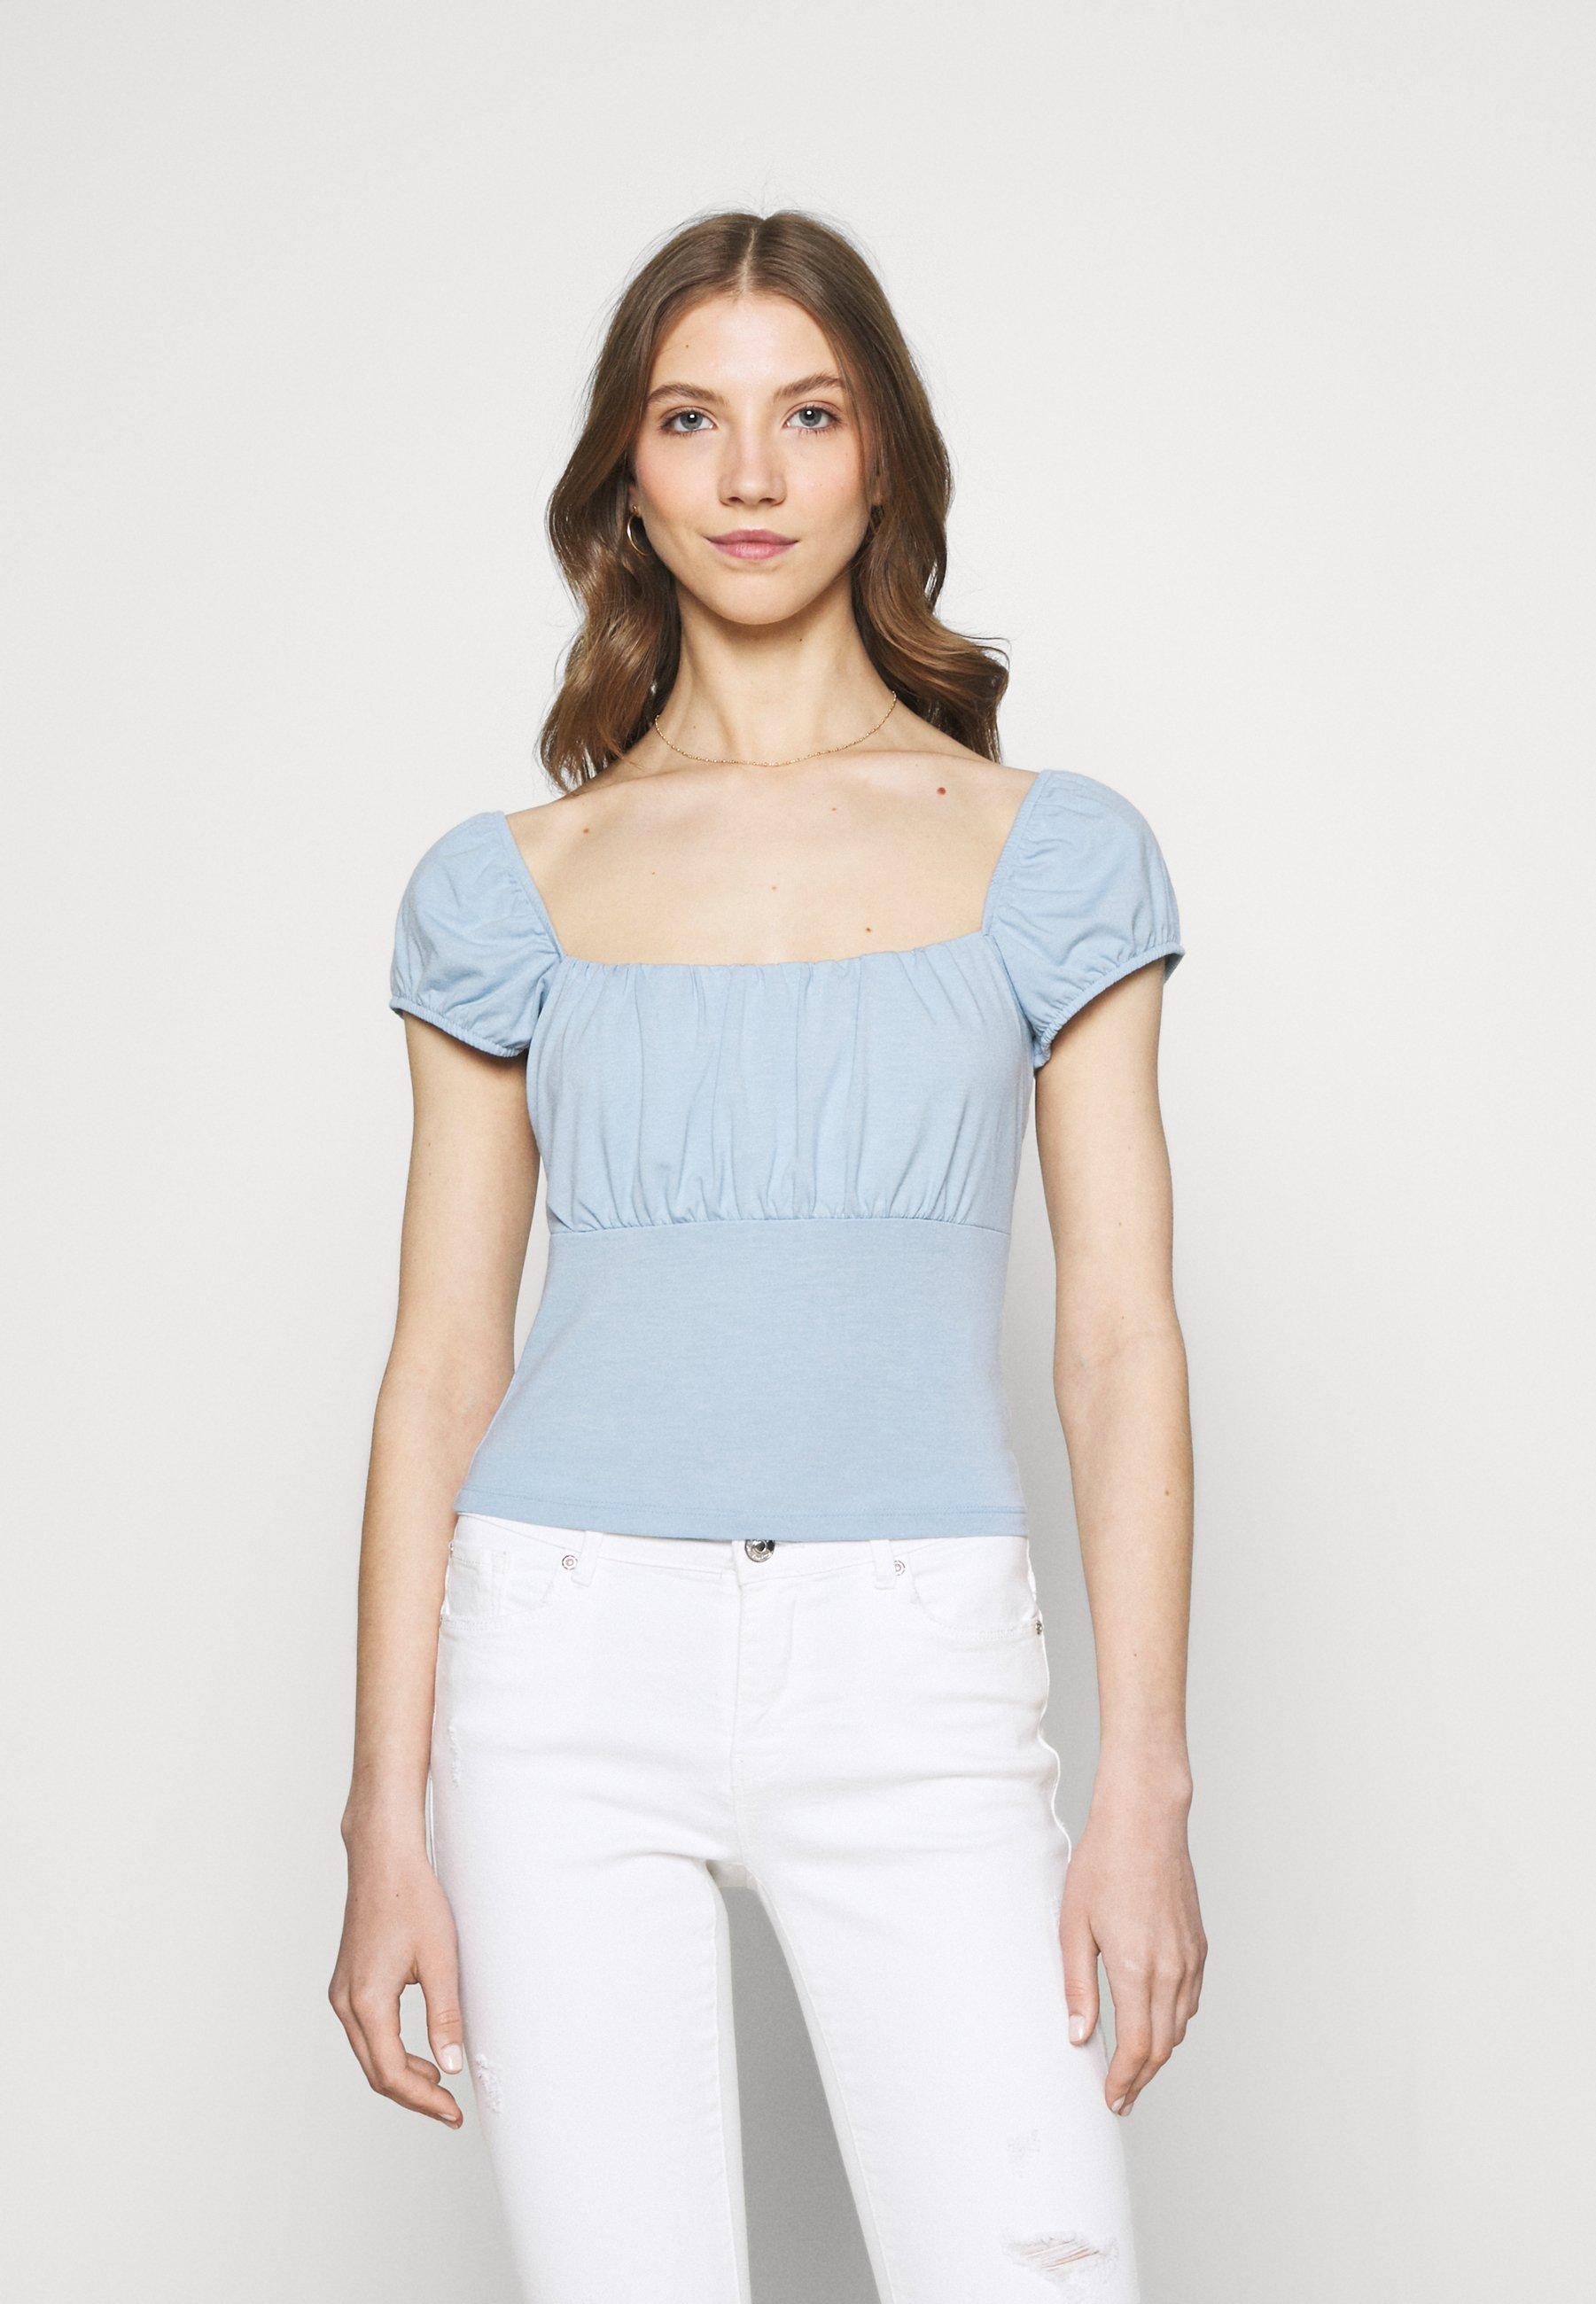 Donna PAMELA REIF X ZALANDO RUCHED DETAIL - T-shirt con stampa